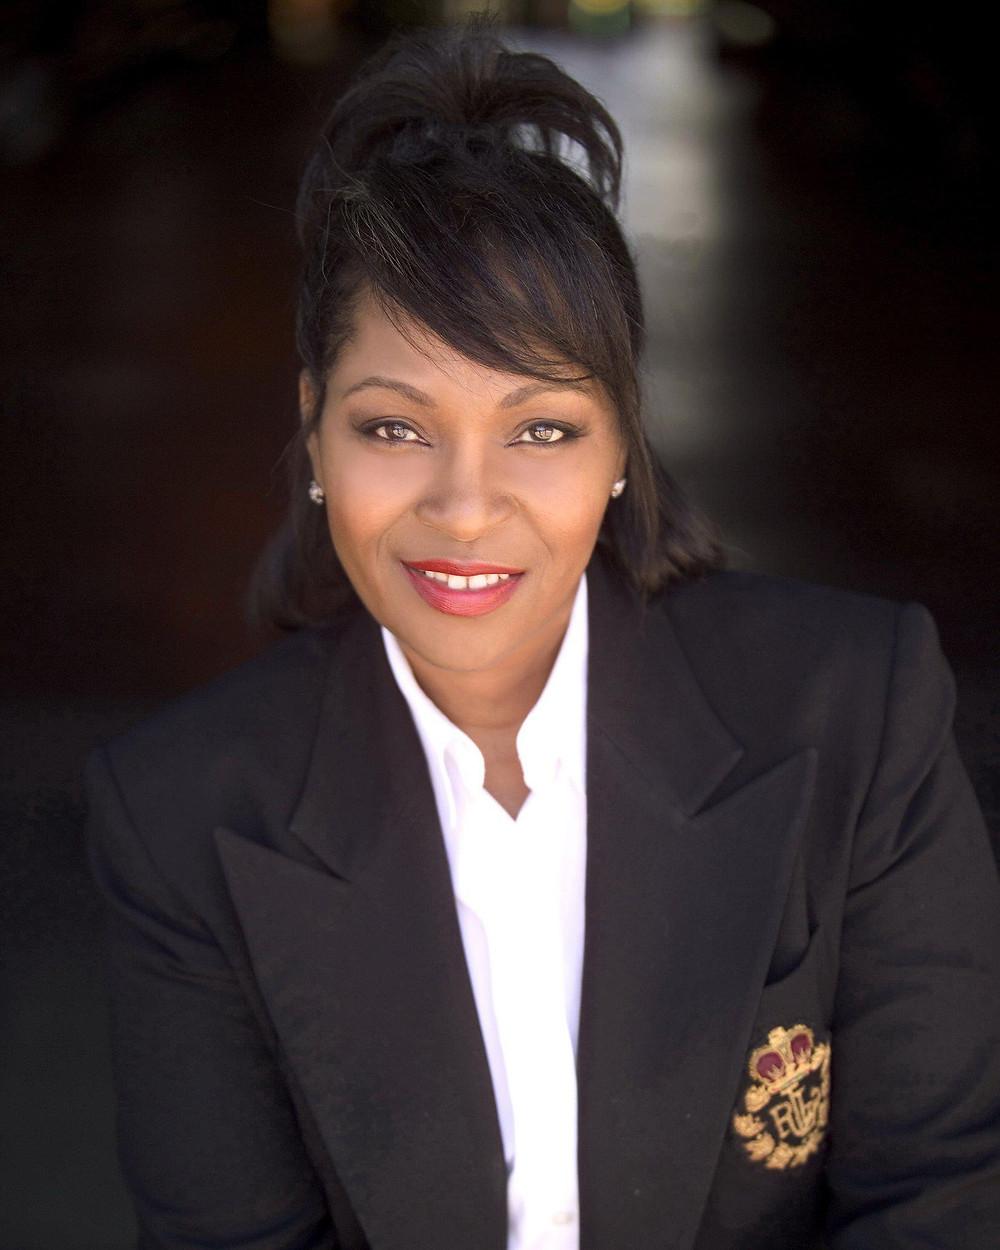 Cathy Durant